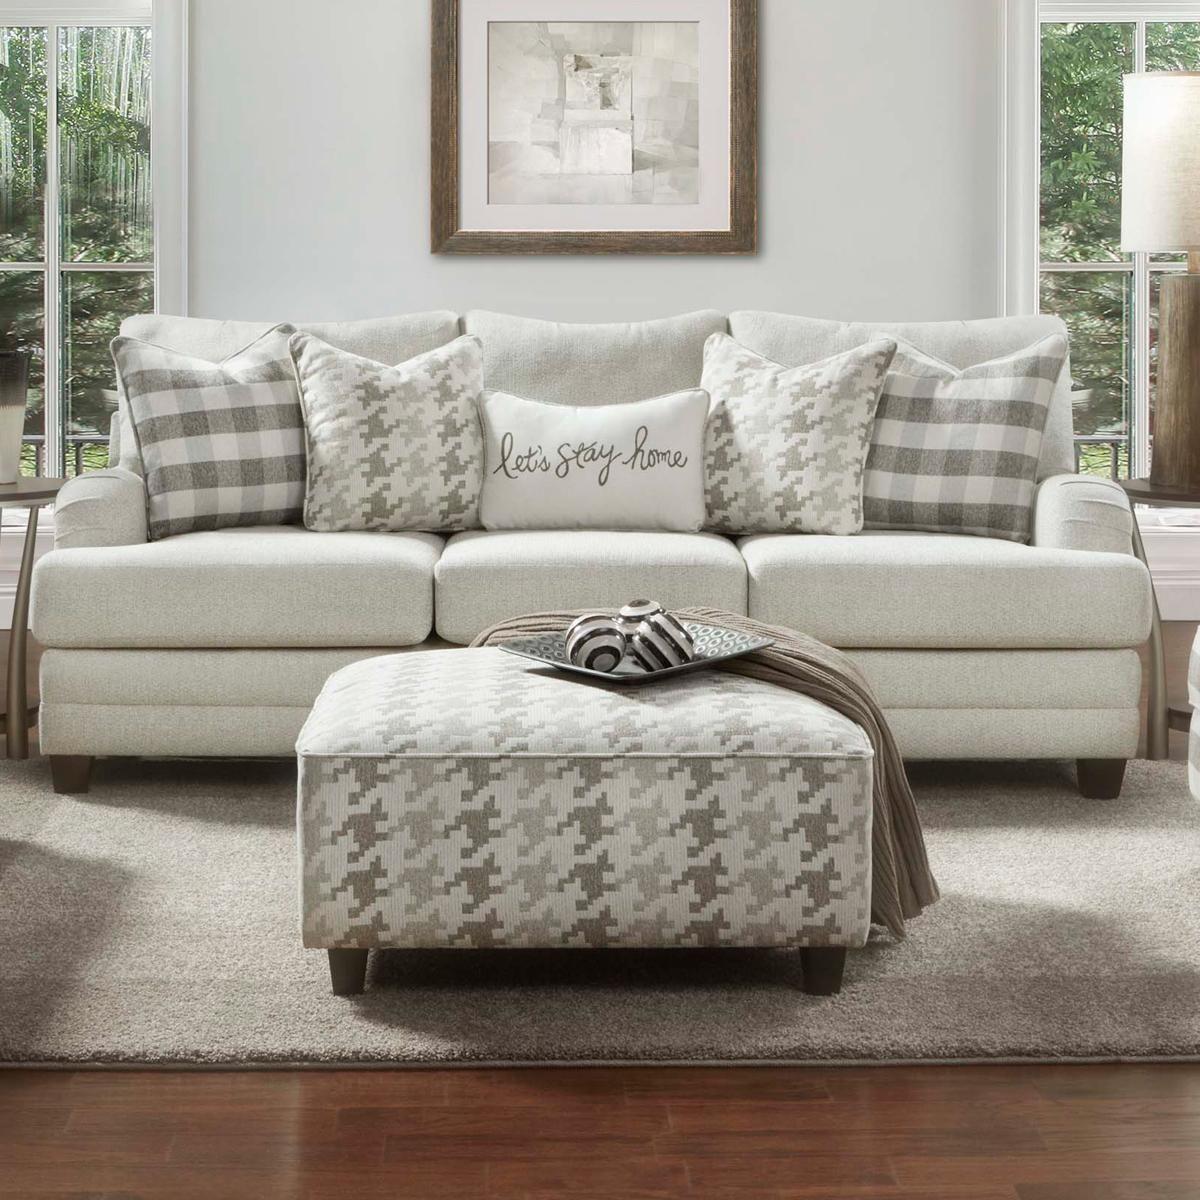 Xenia Sofa In Basic Wool Nebraska Furniture Mart Furniture